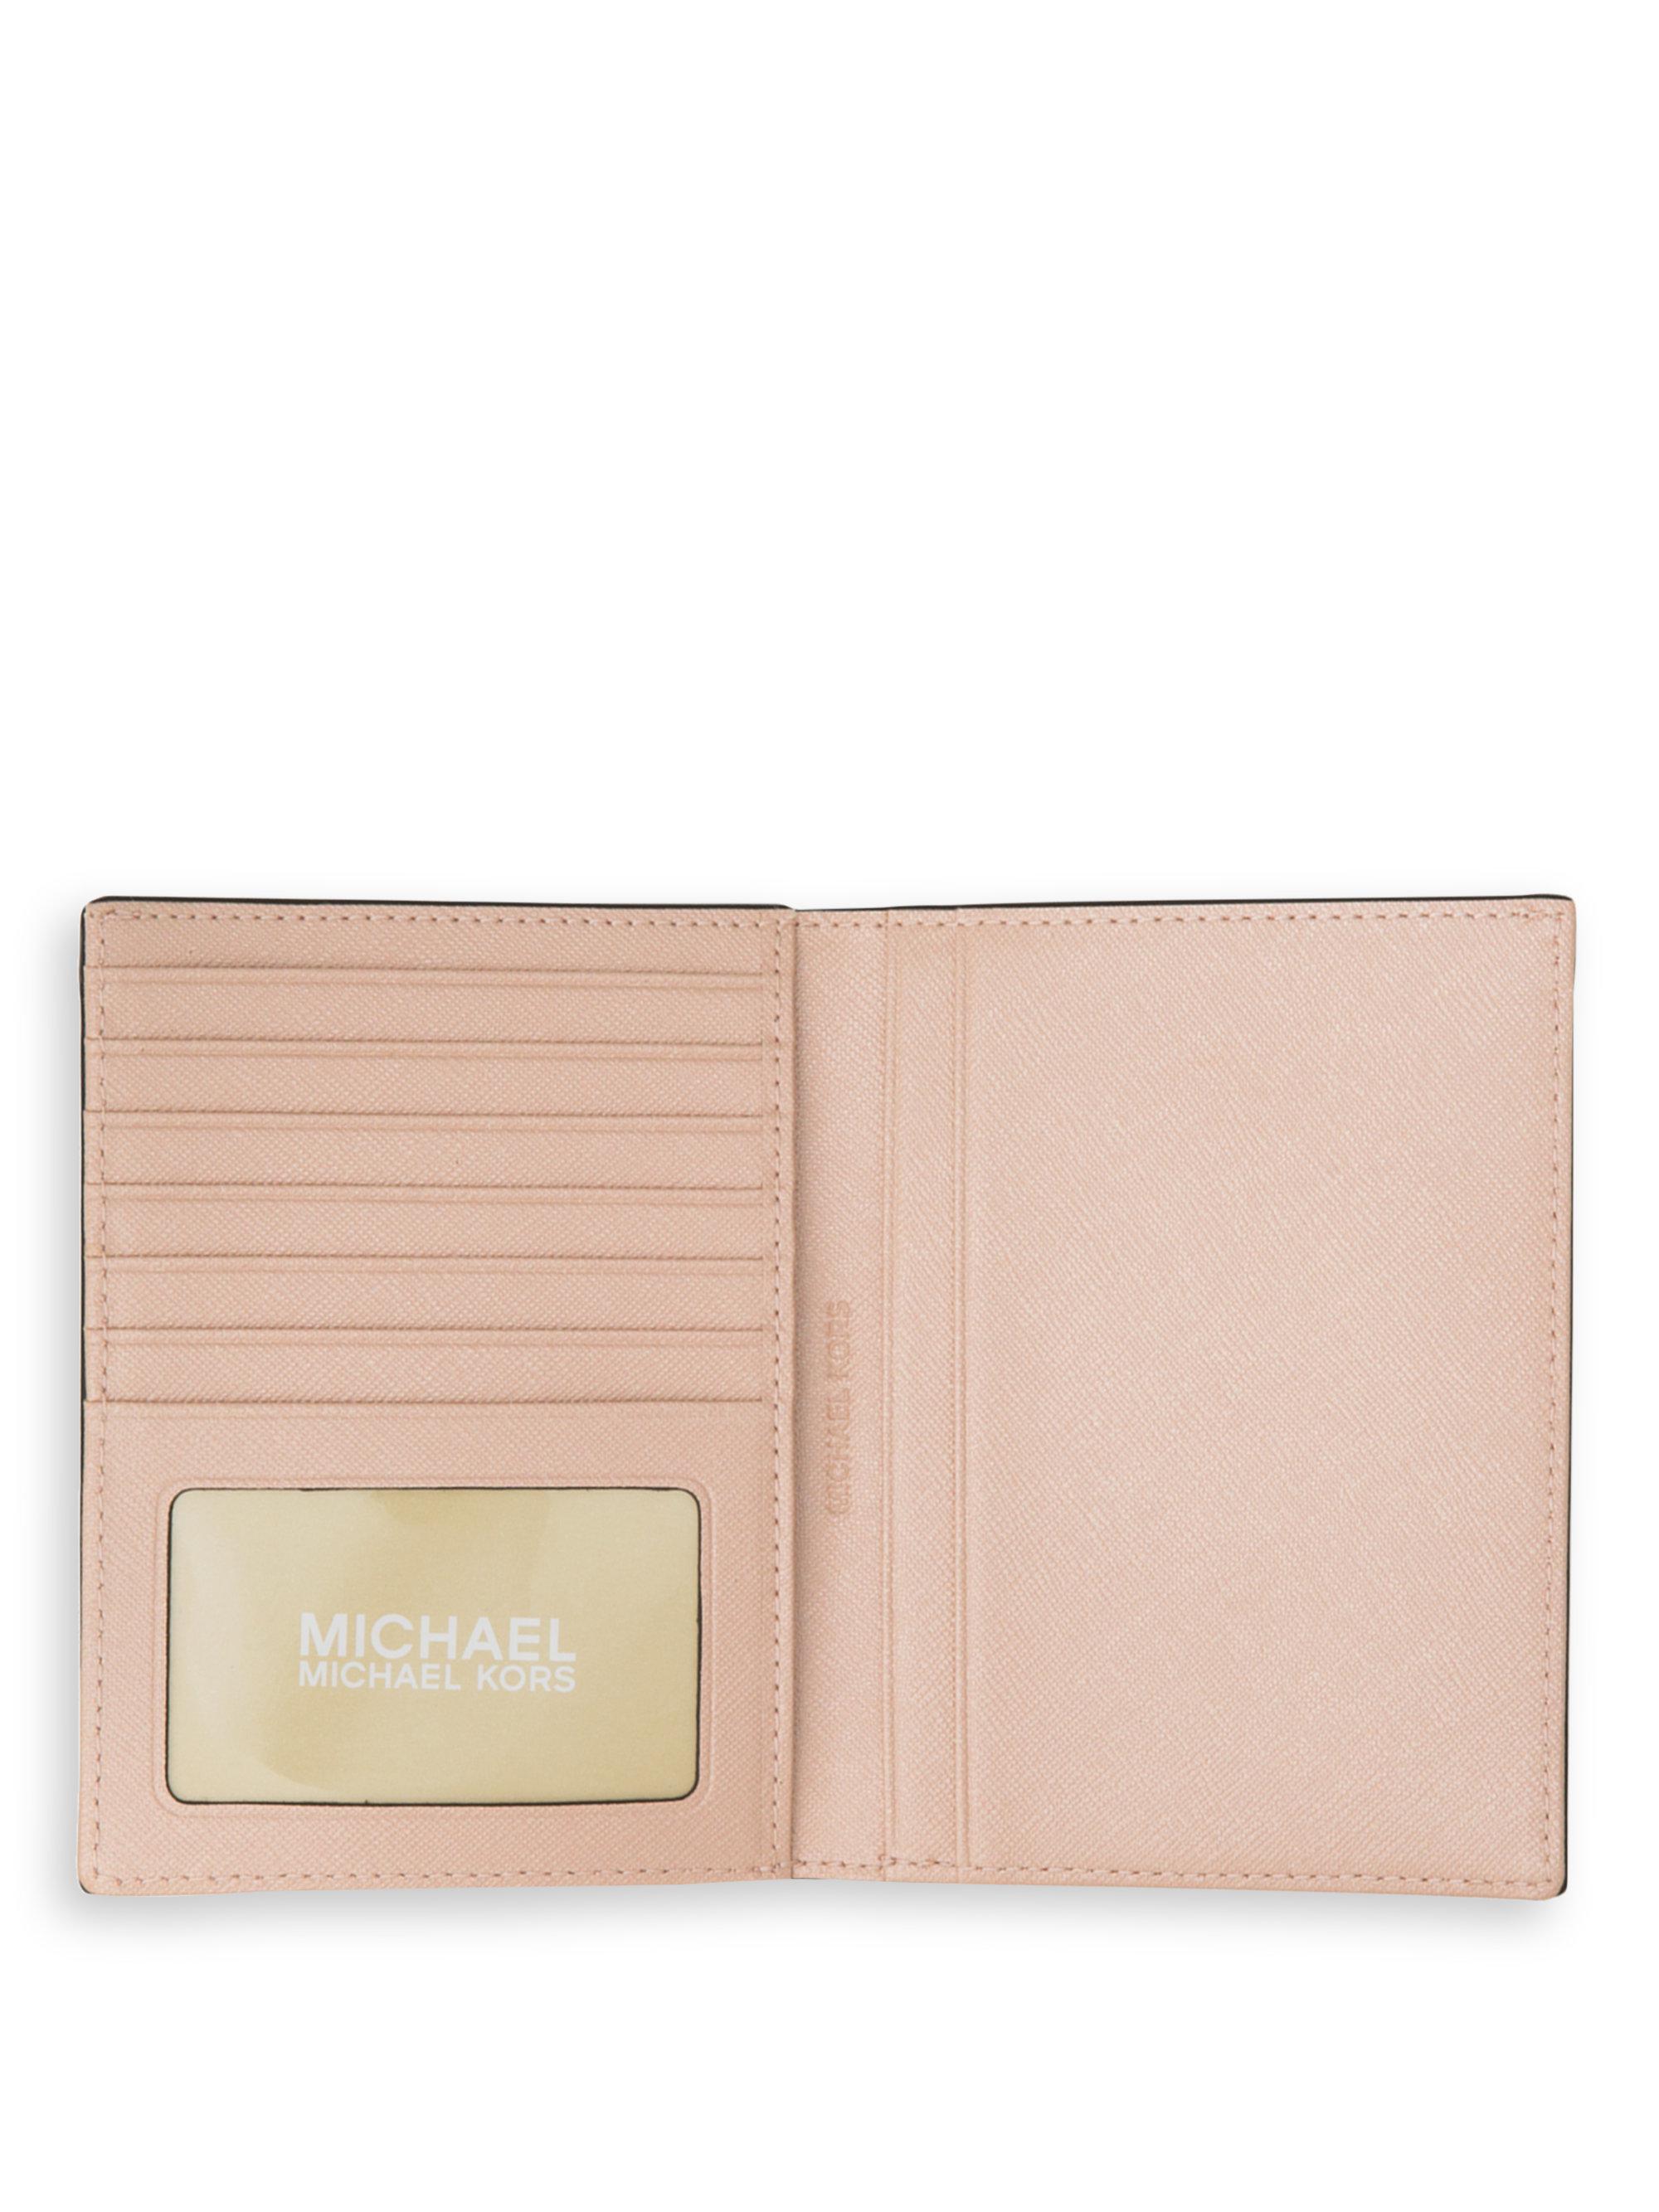 2d2c3c684f1 ... Lyst - Michael Michael Kors Leather Passport Holder in Pink ...